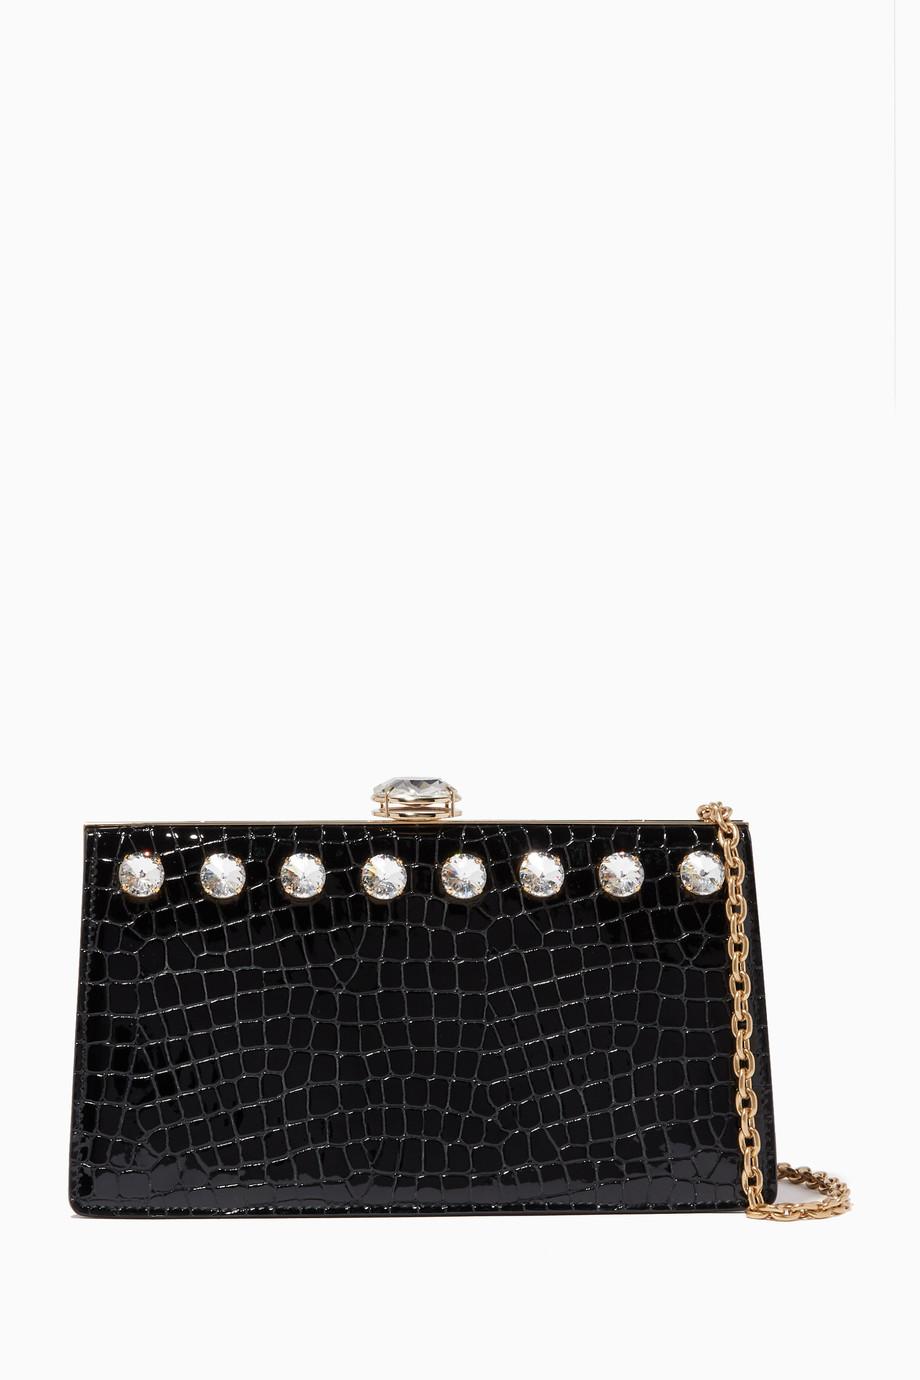 4cc71197e658d Shop Miu Miu Black Solitaire Crocodile-Effect Clutch Bag for Women ...